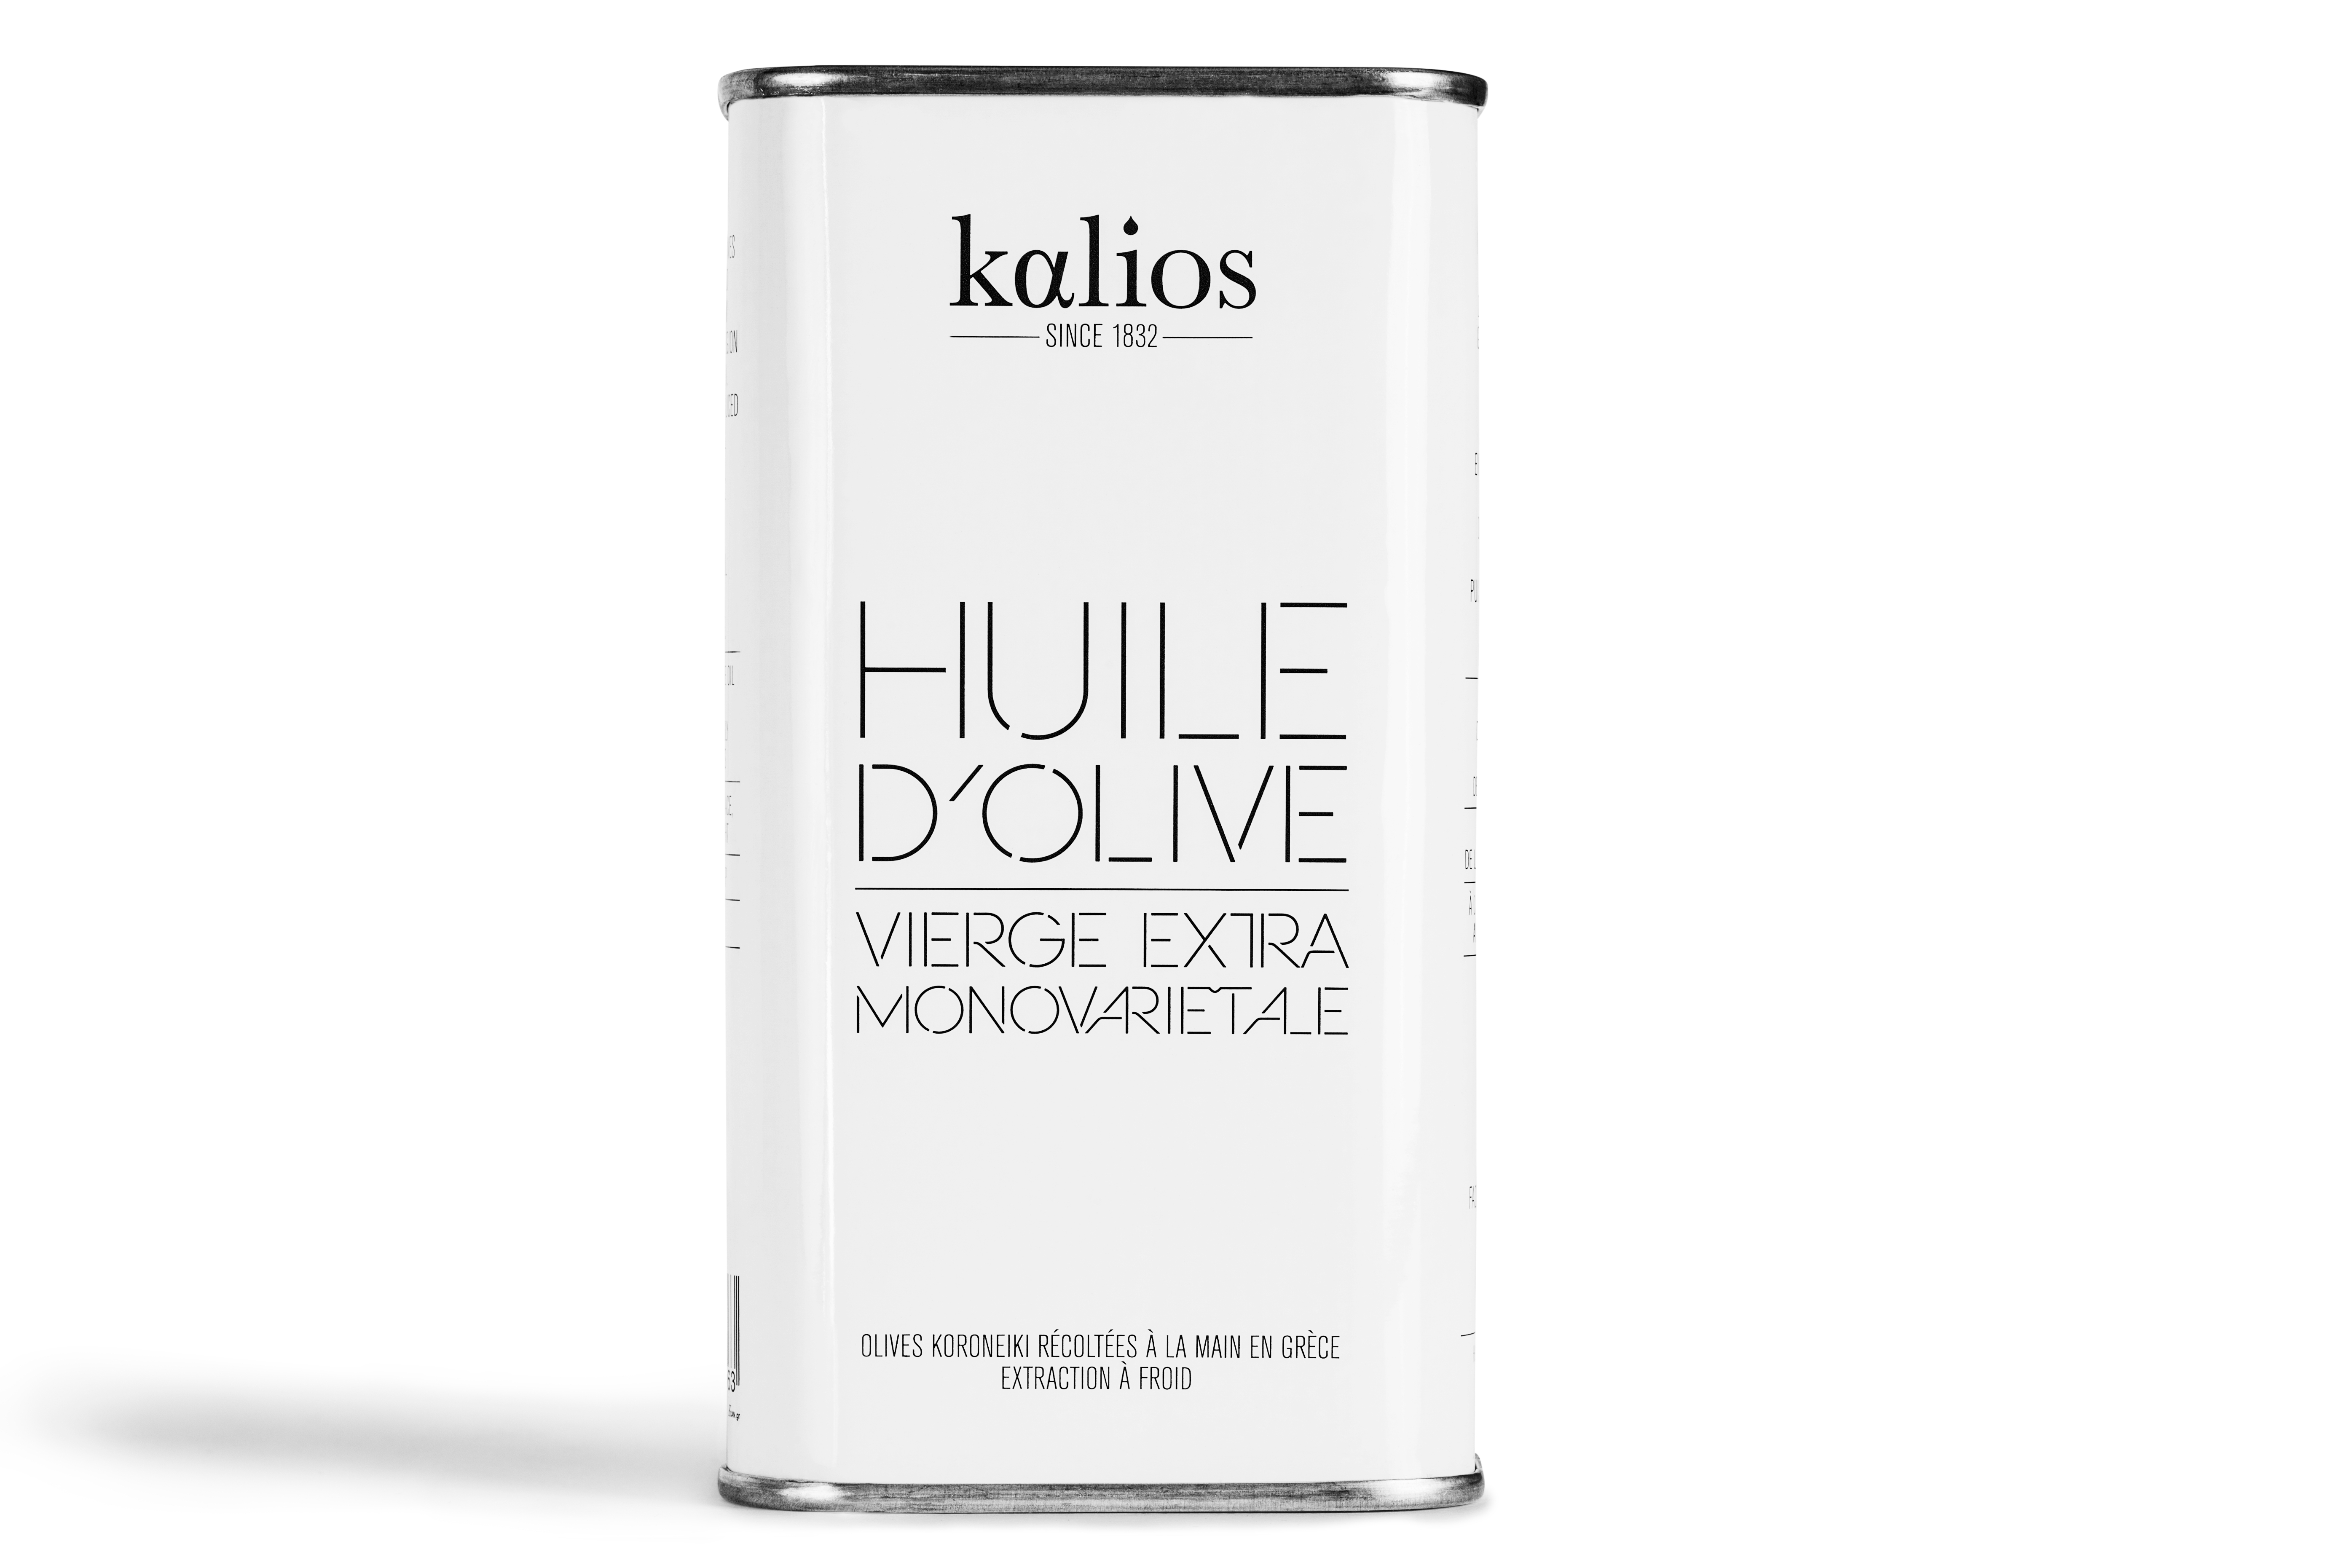 Huile d'olive vierge monvarietale, Kalios (250 ml)